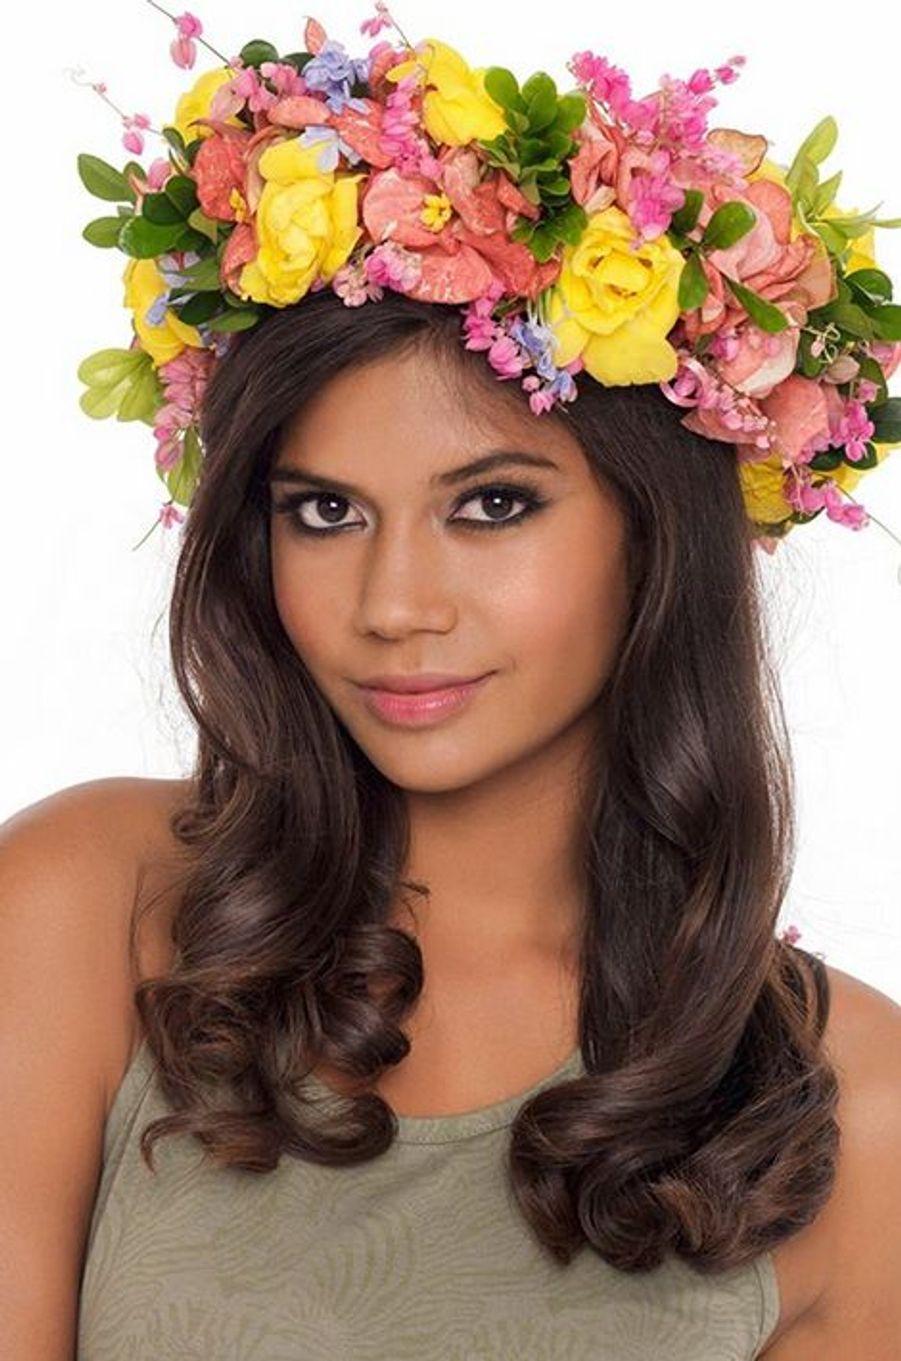 Miss Tahiti - Vaimiti Teiefitu (18 ans - 1,78 m) - Étudiante en prépa HEC